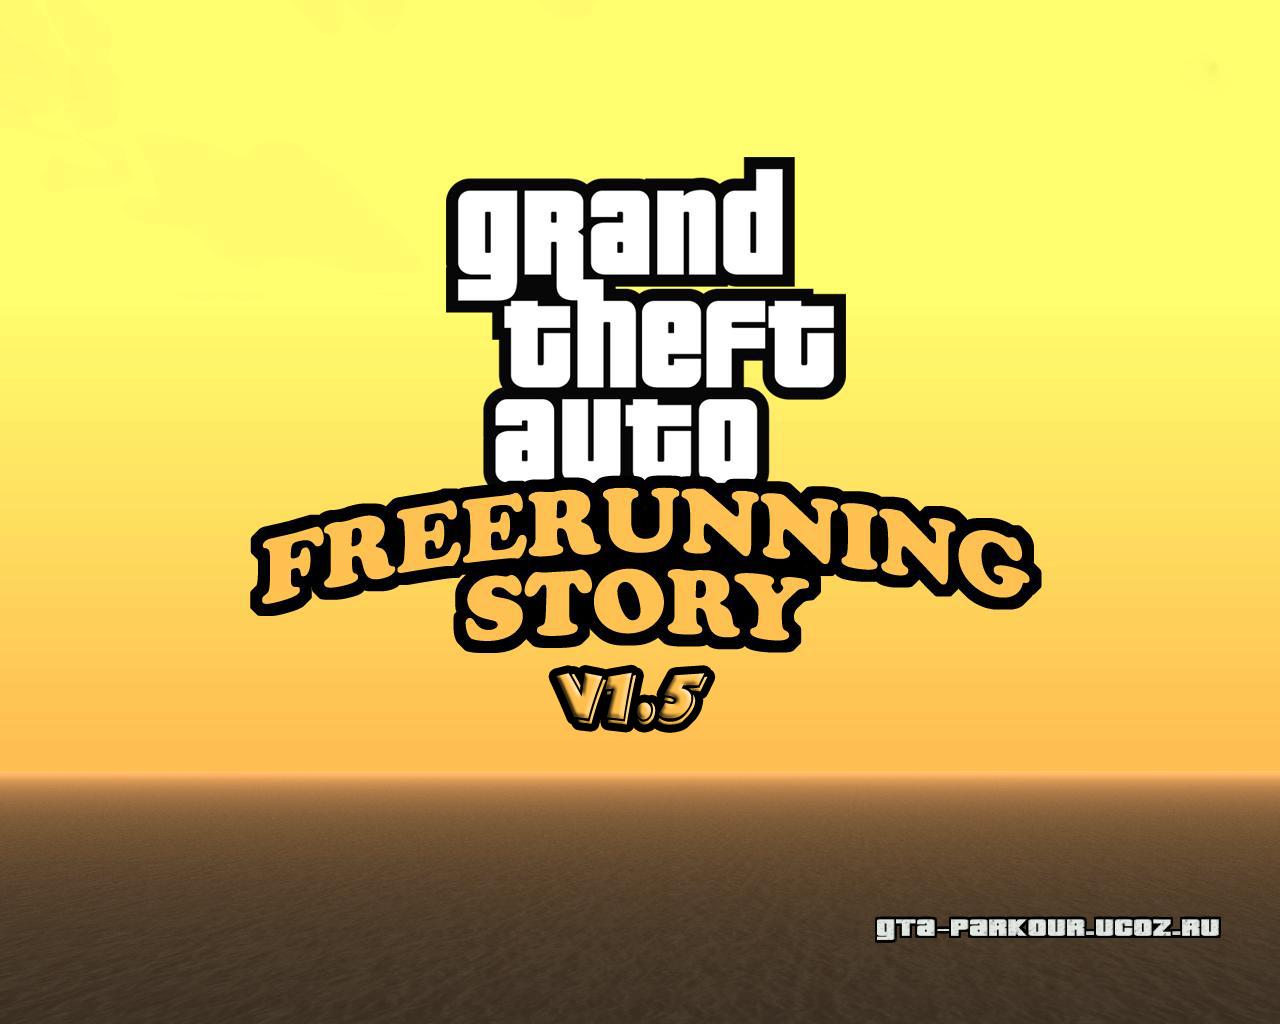 FreeRunning Story 1.5